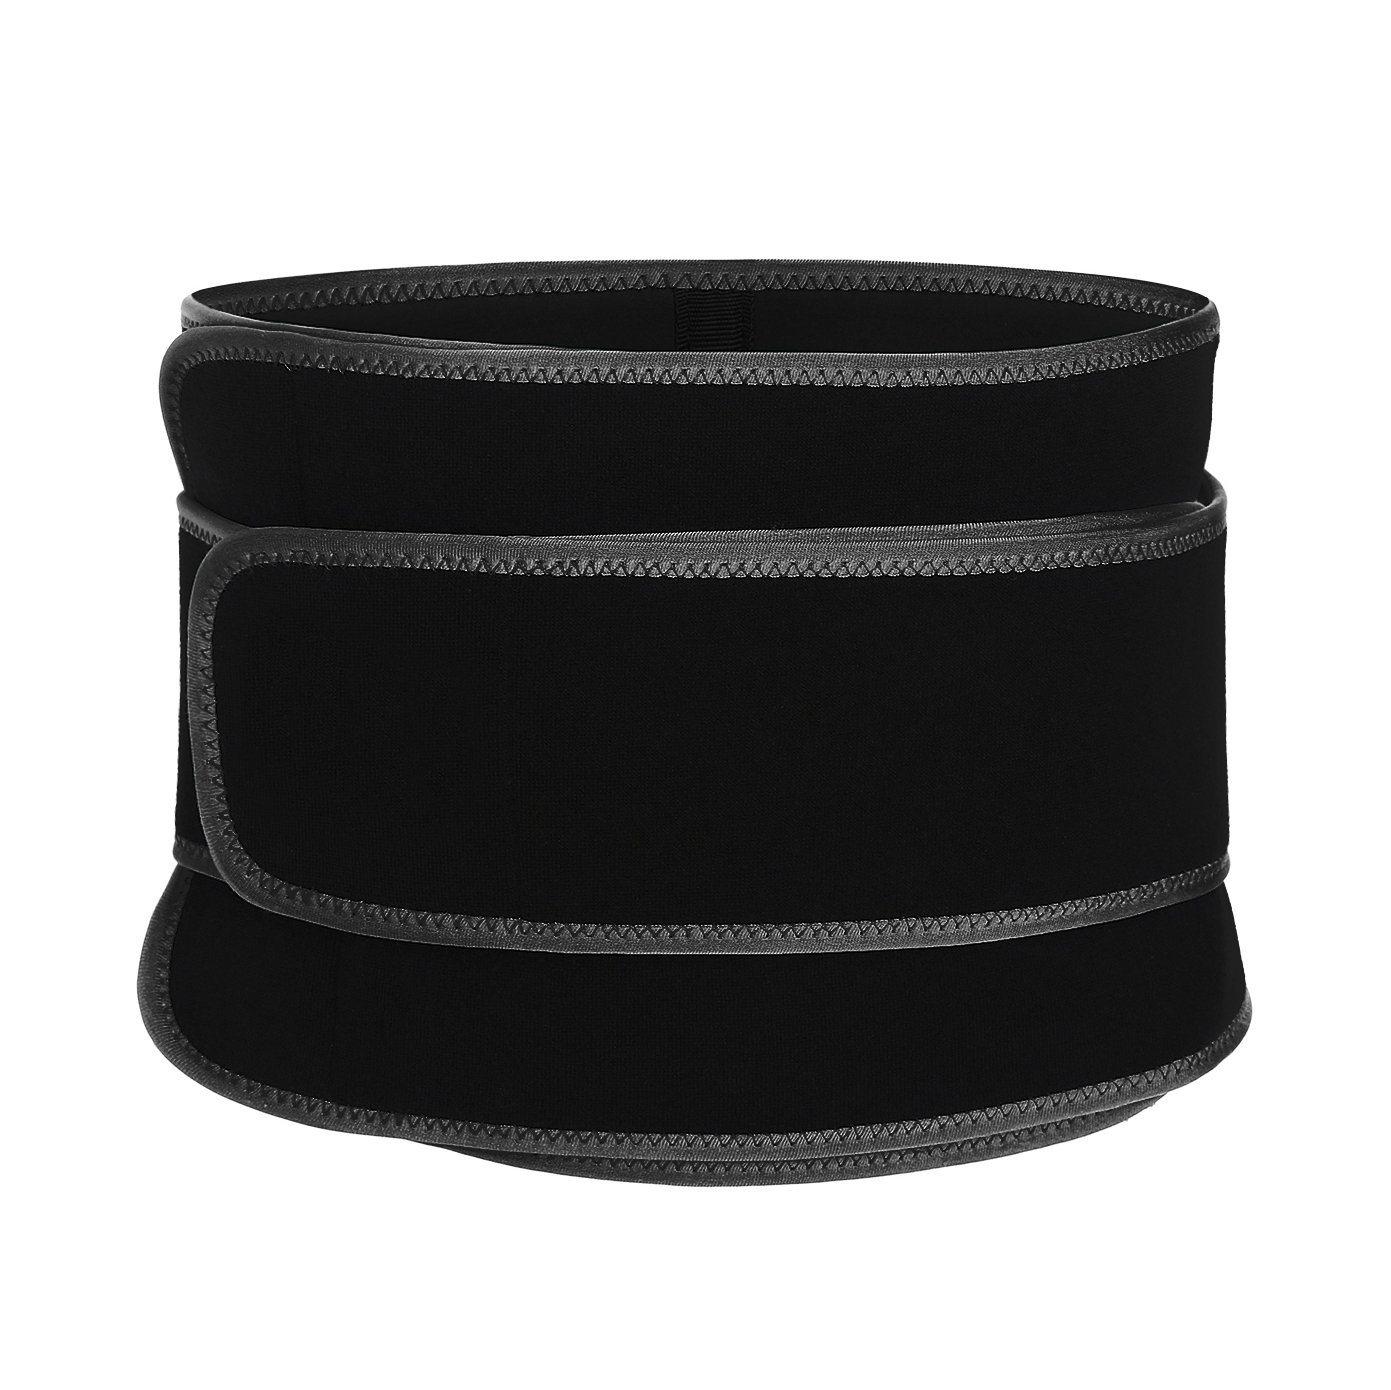 780b88af5 China Men Waist Trainer Vest for Weight Loss Hot Neoprene Corset Belt -  China Neoprene Socks Belt